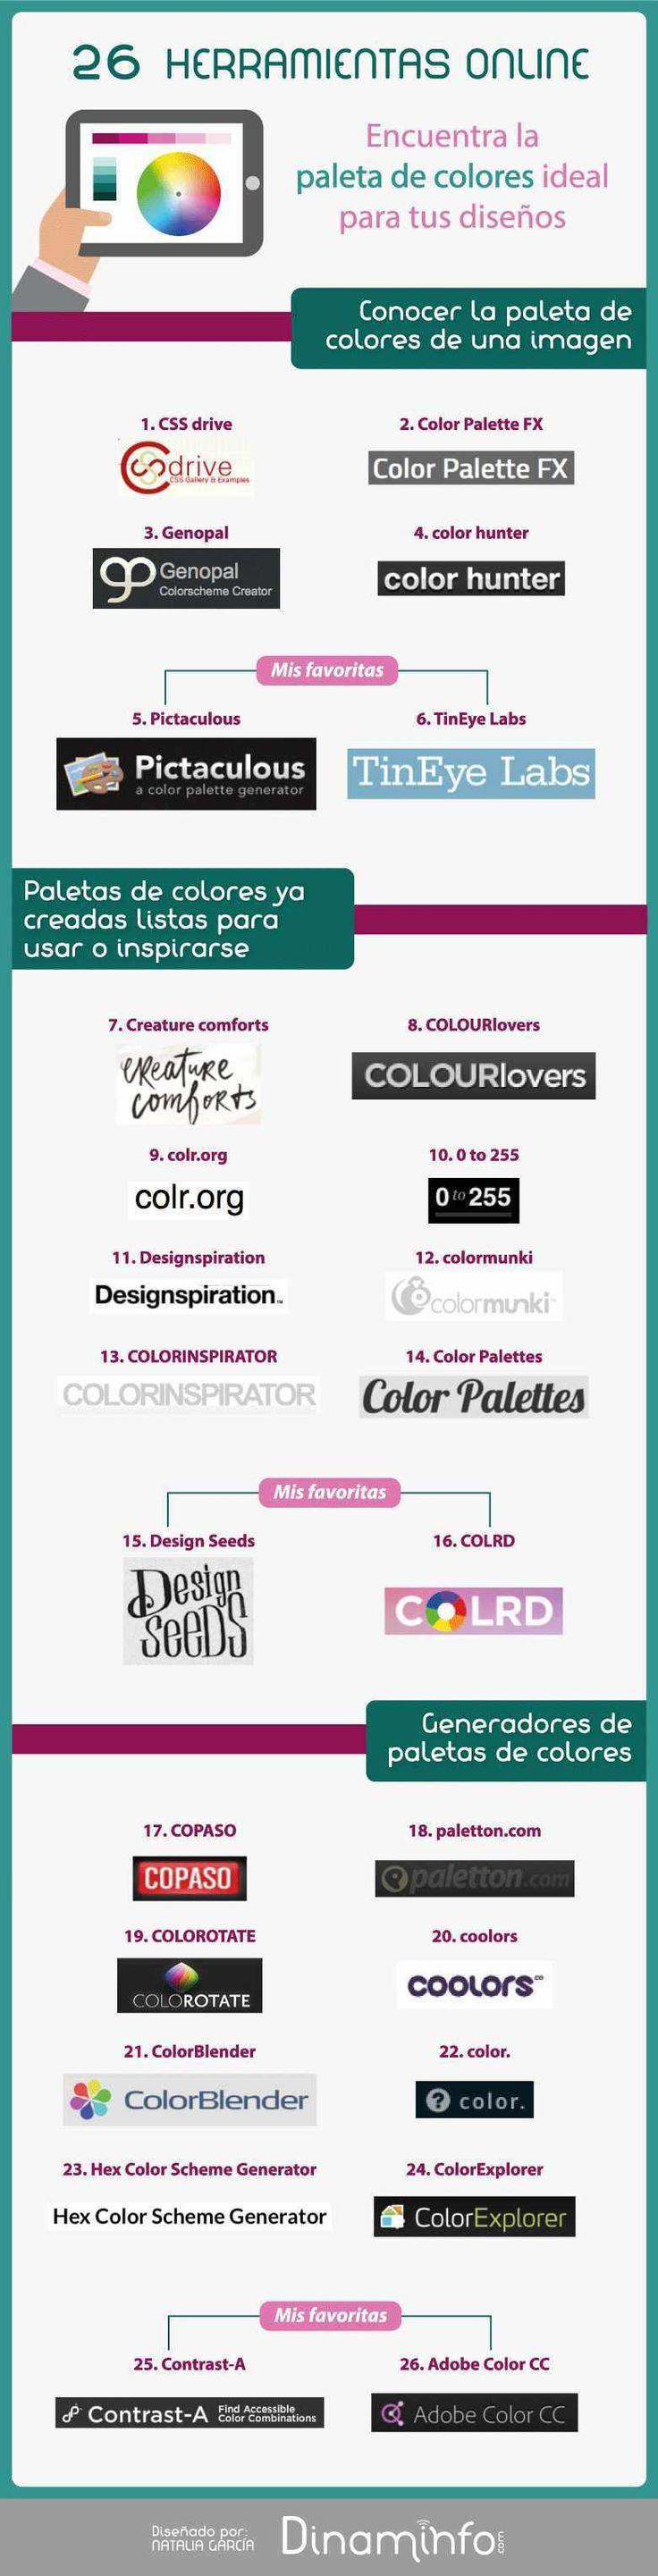 16 herramientas online para elegir la mejor Paleta de Colores #infografia #infographic #design